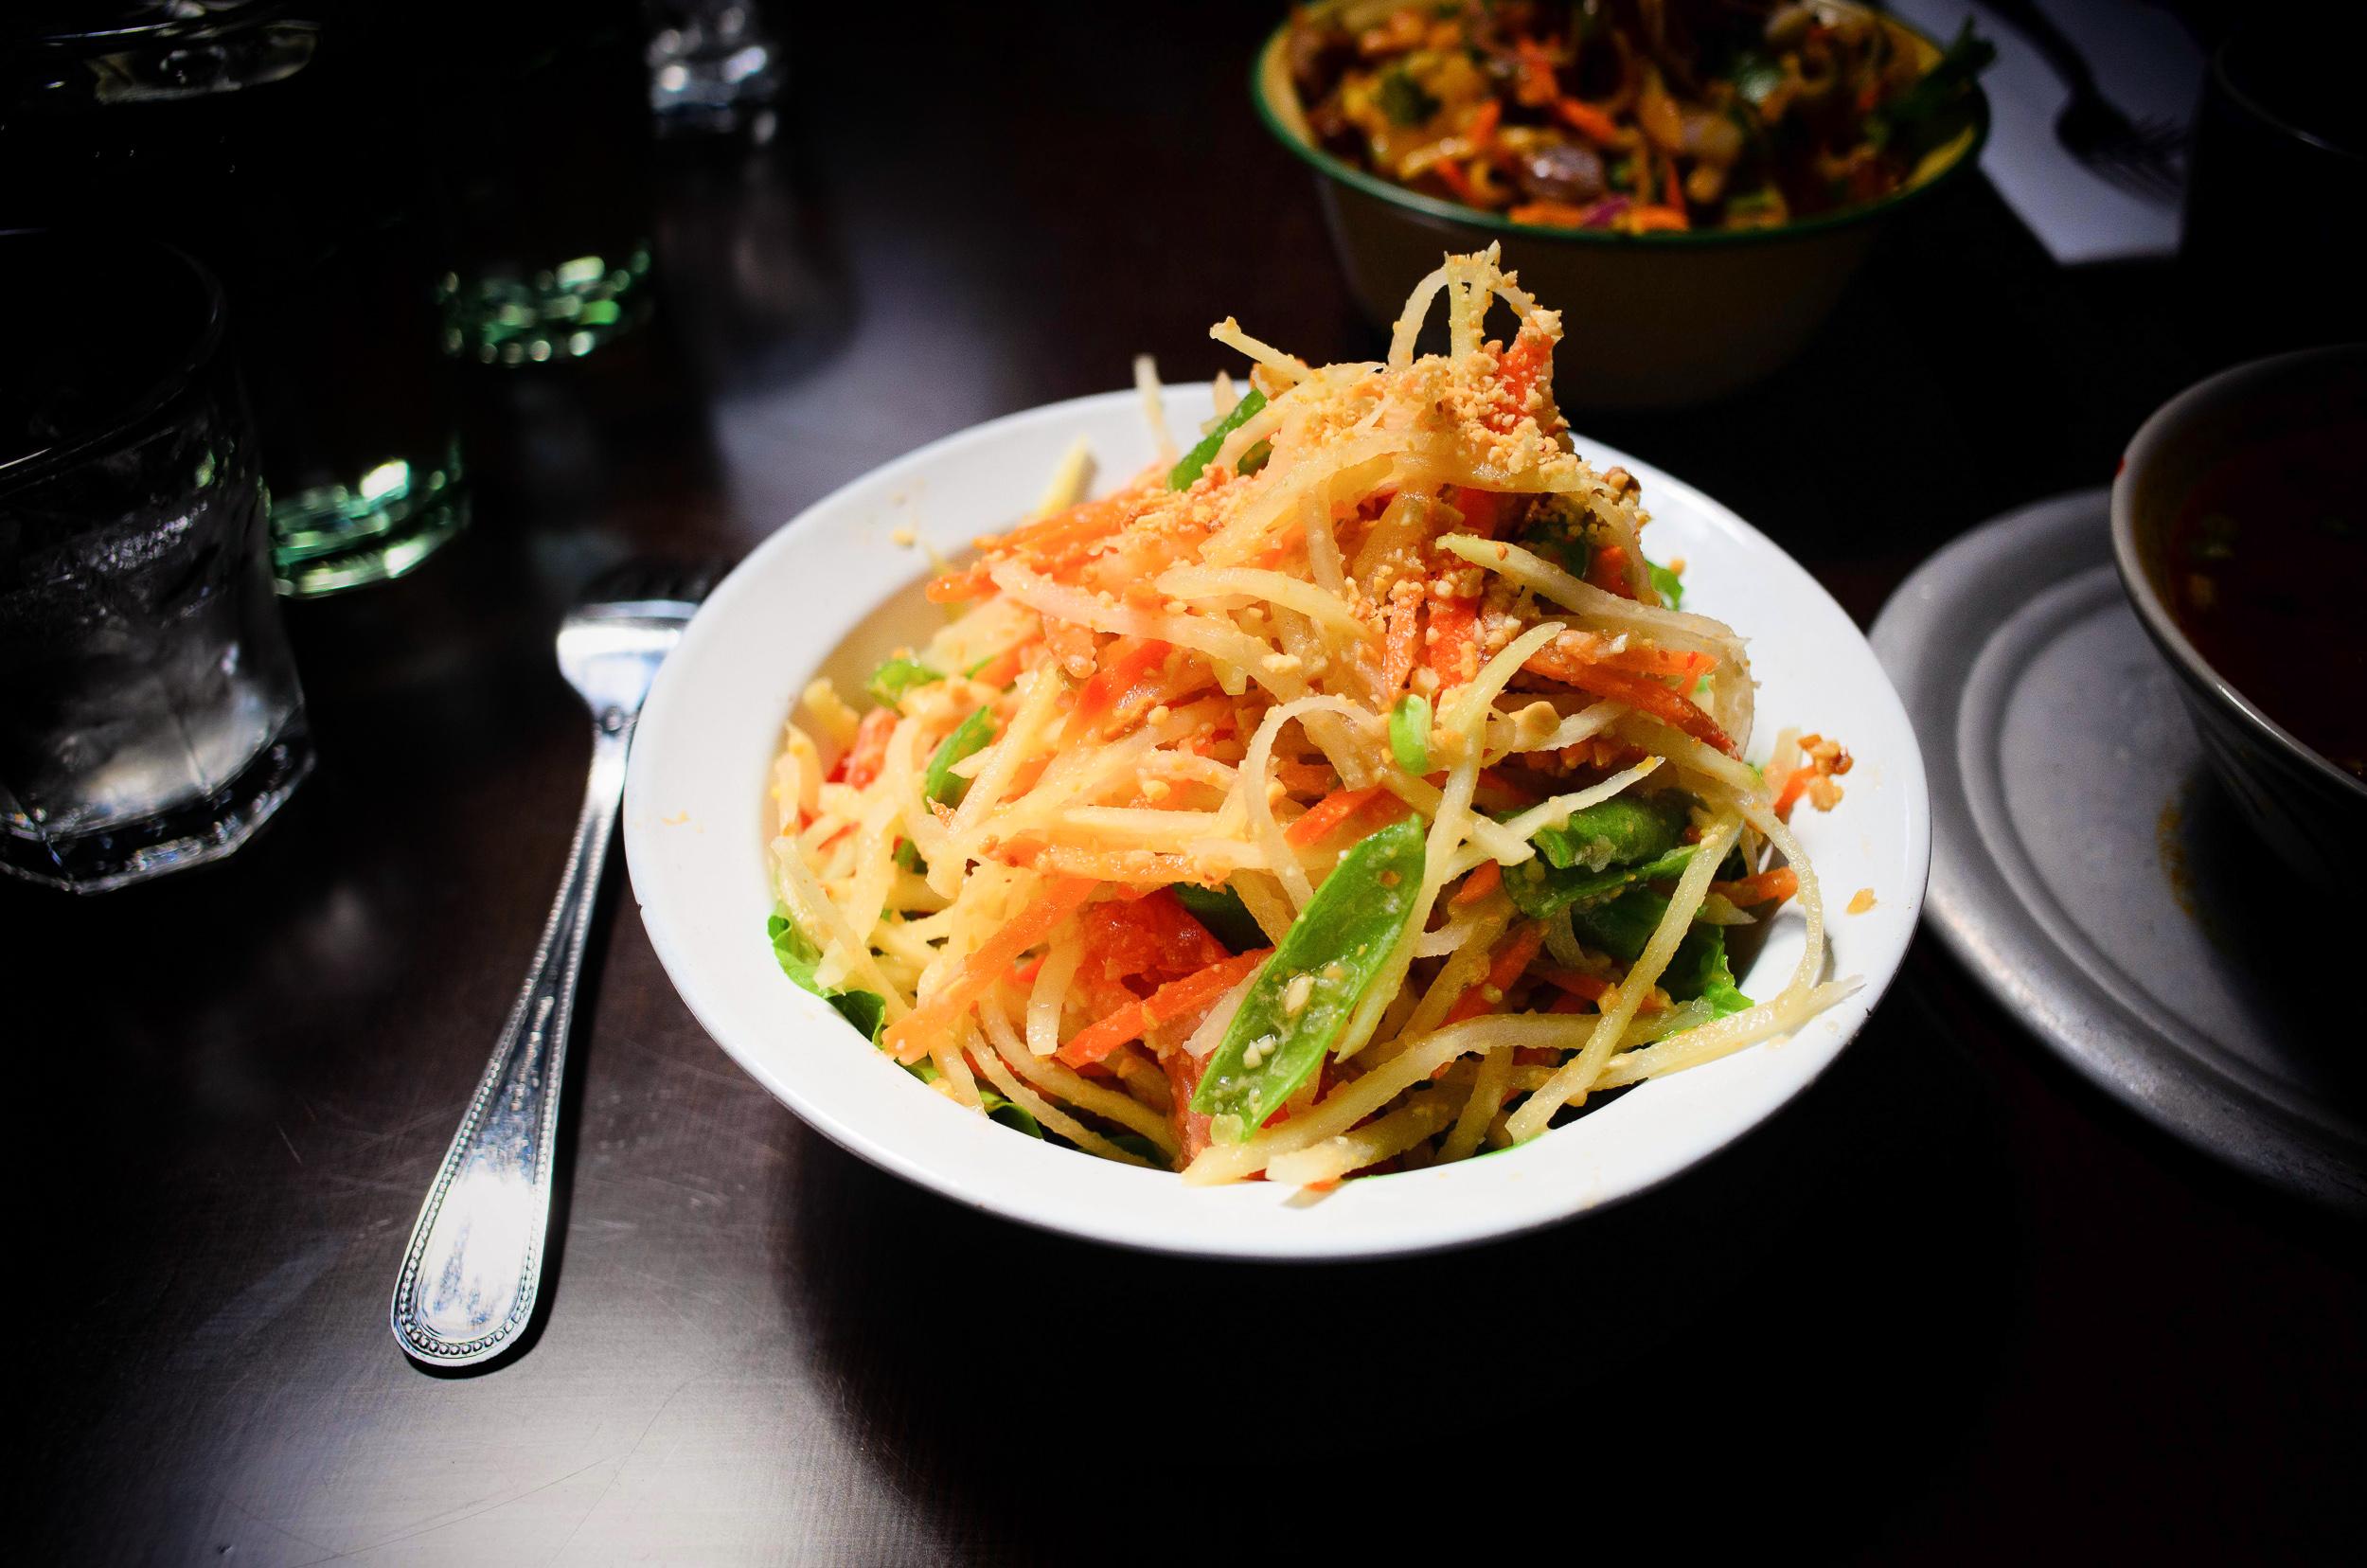 Green papaya salad: tomatoes, string beans, roasted peanuts in c